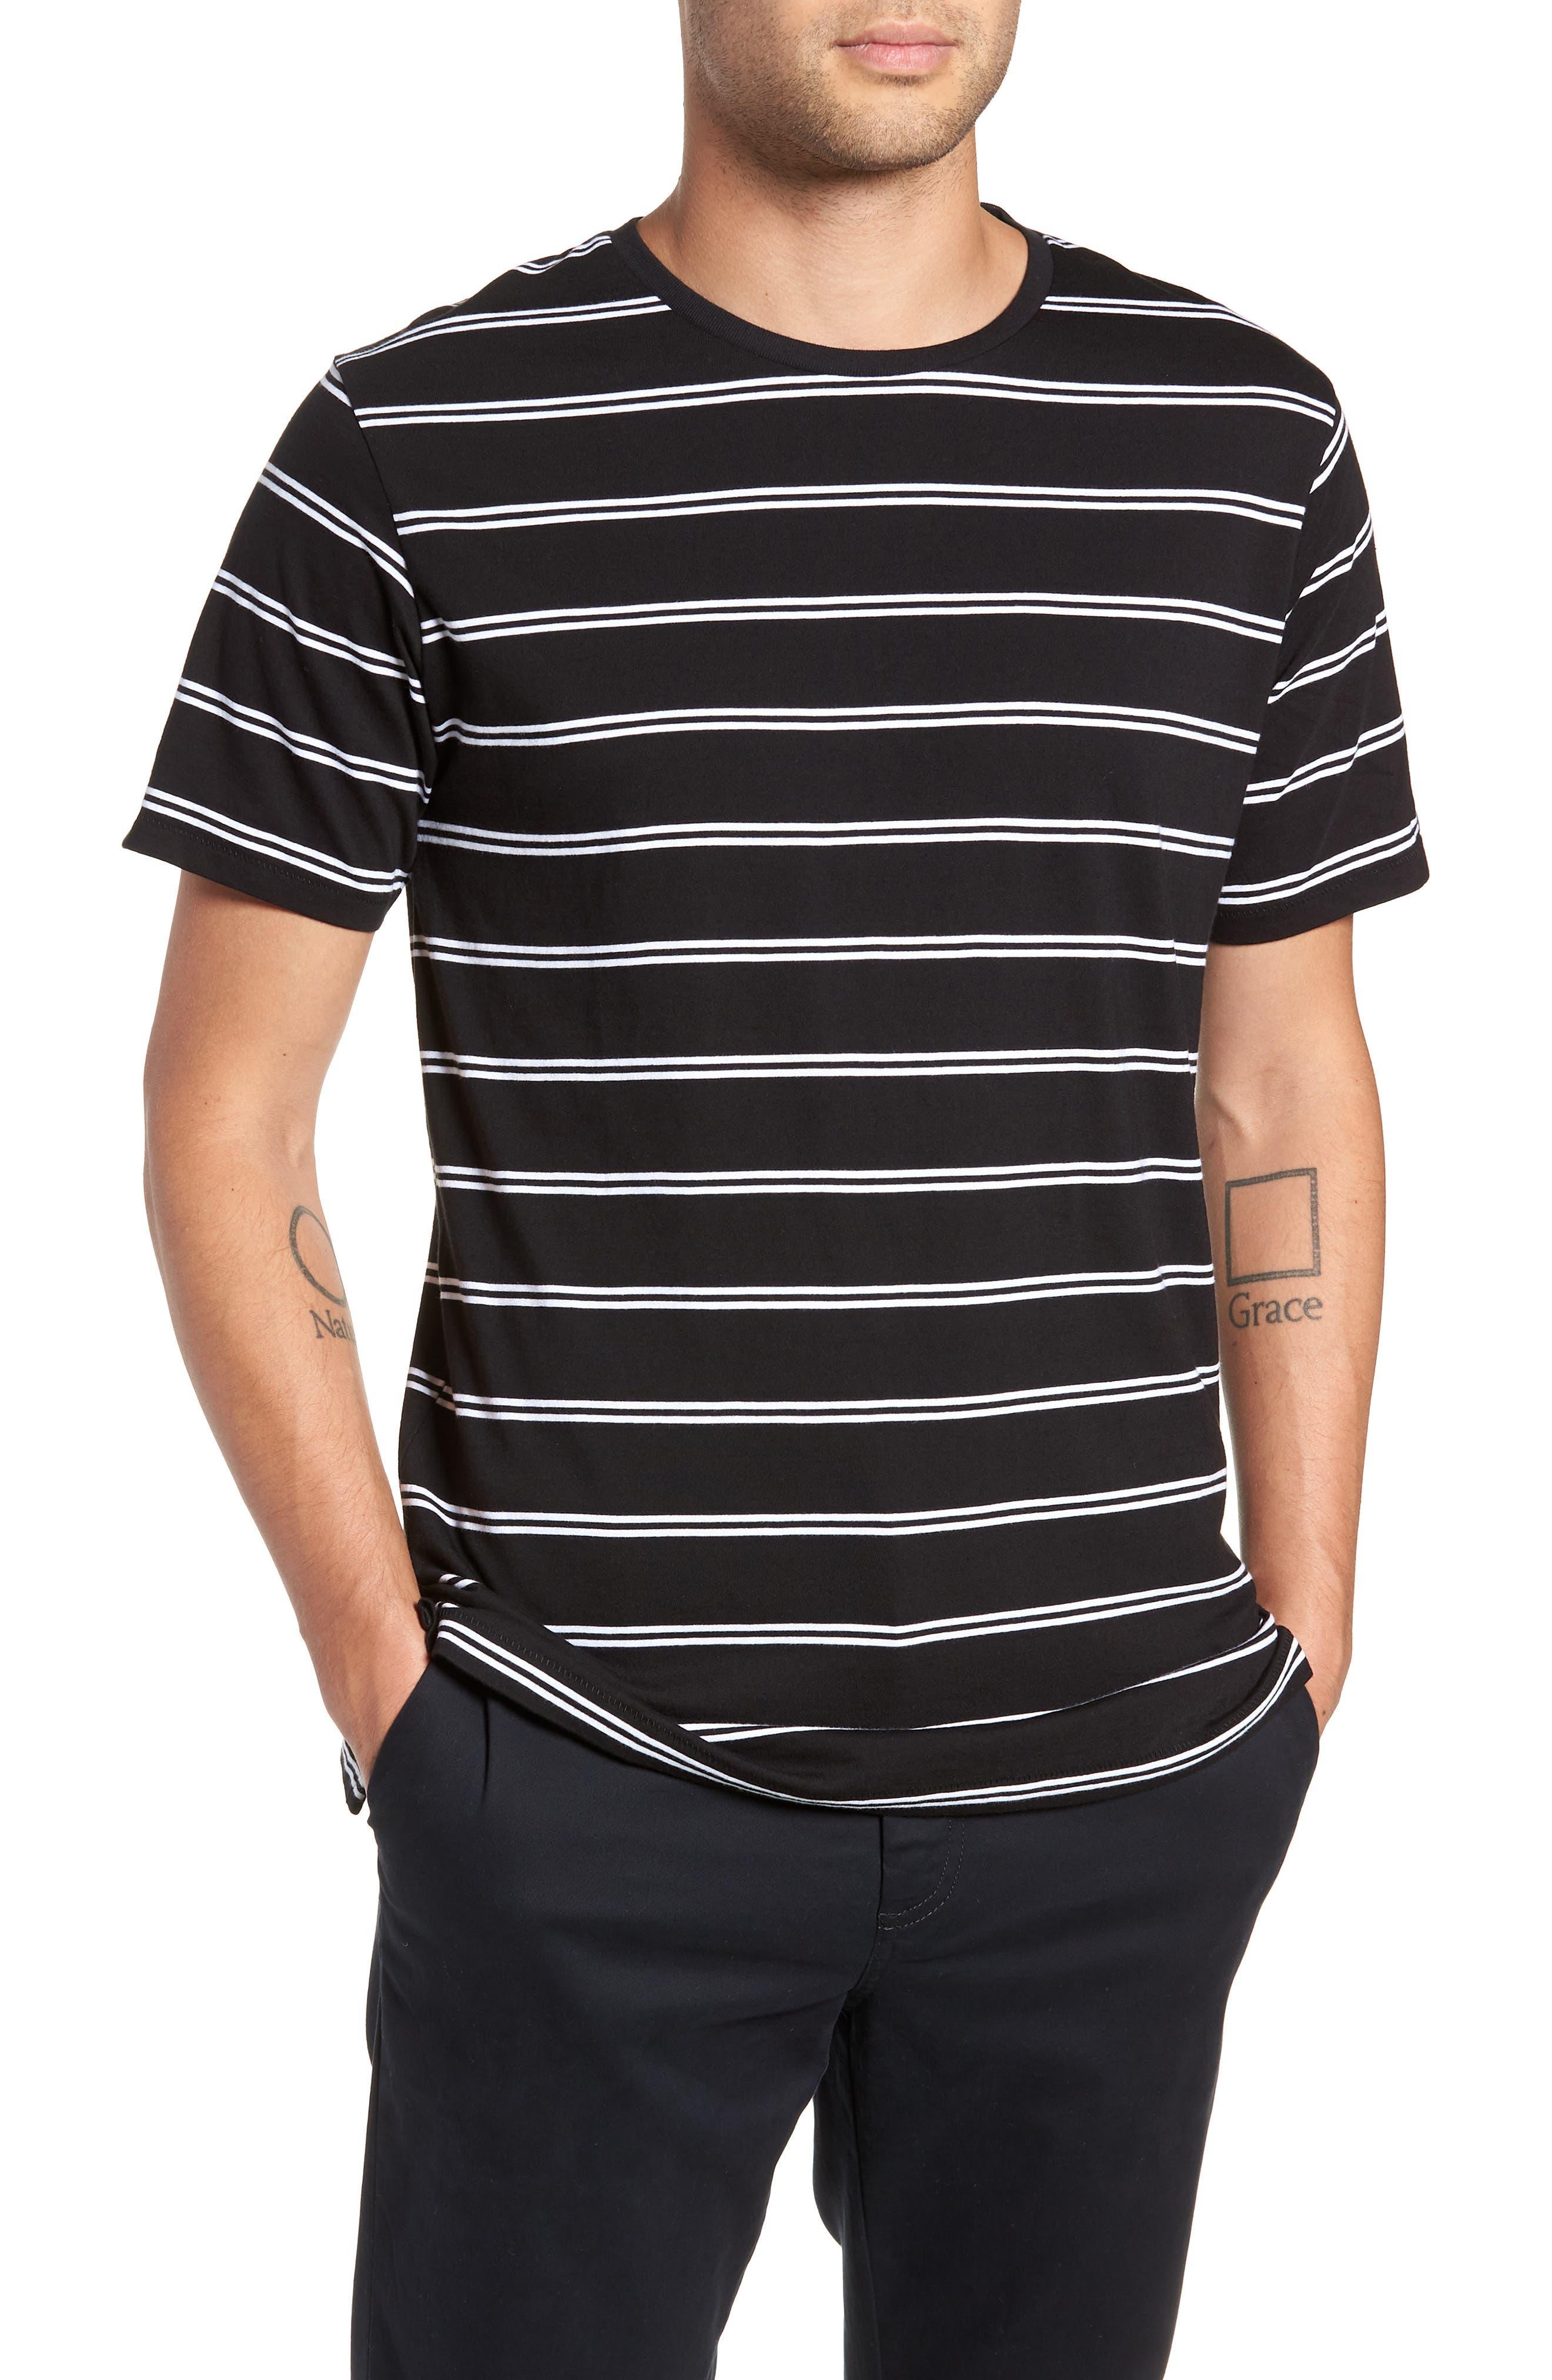 ZANEROBE Channel Flintlock T-Shirt, Main, color, 001